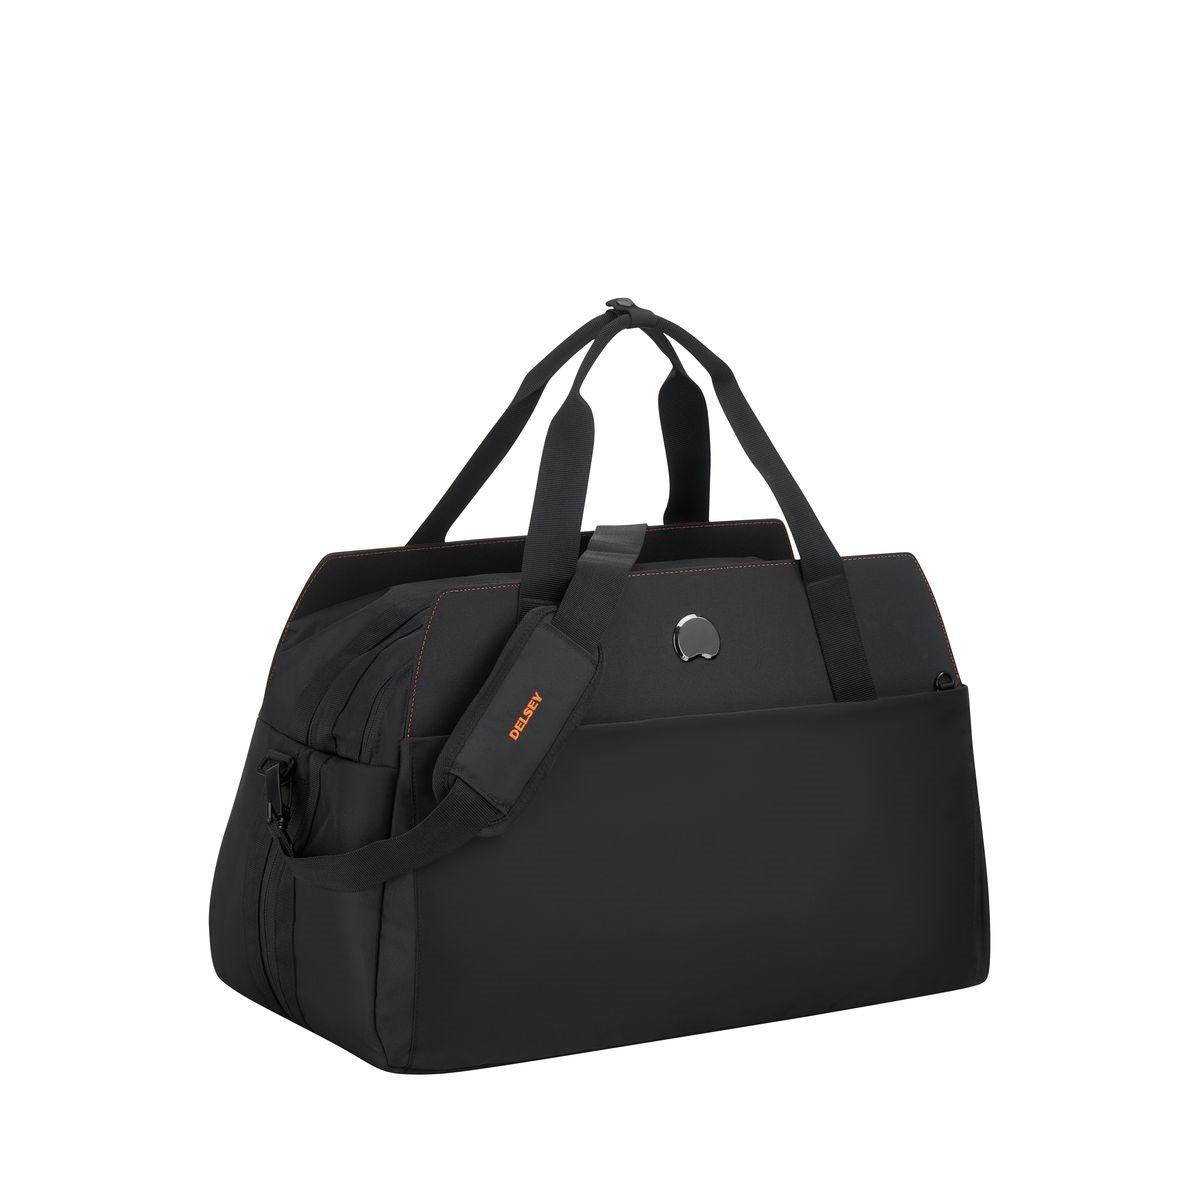 Delsey Τσάντα ταξιδίου 34x55x25/30cm με θέση για PC 15,6'' σειρά Daily s Orange Black